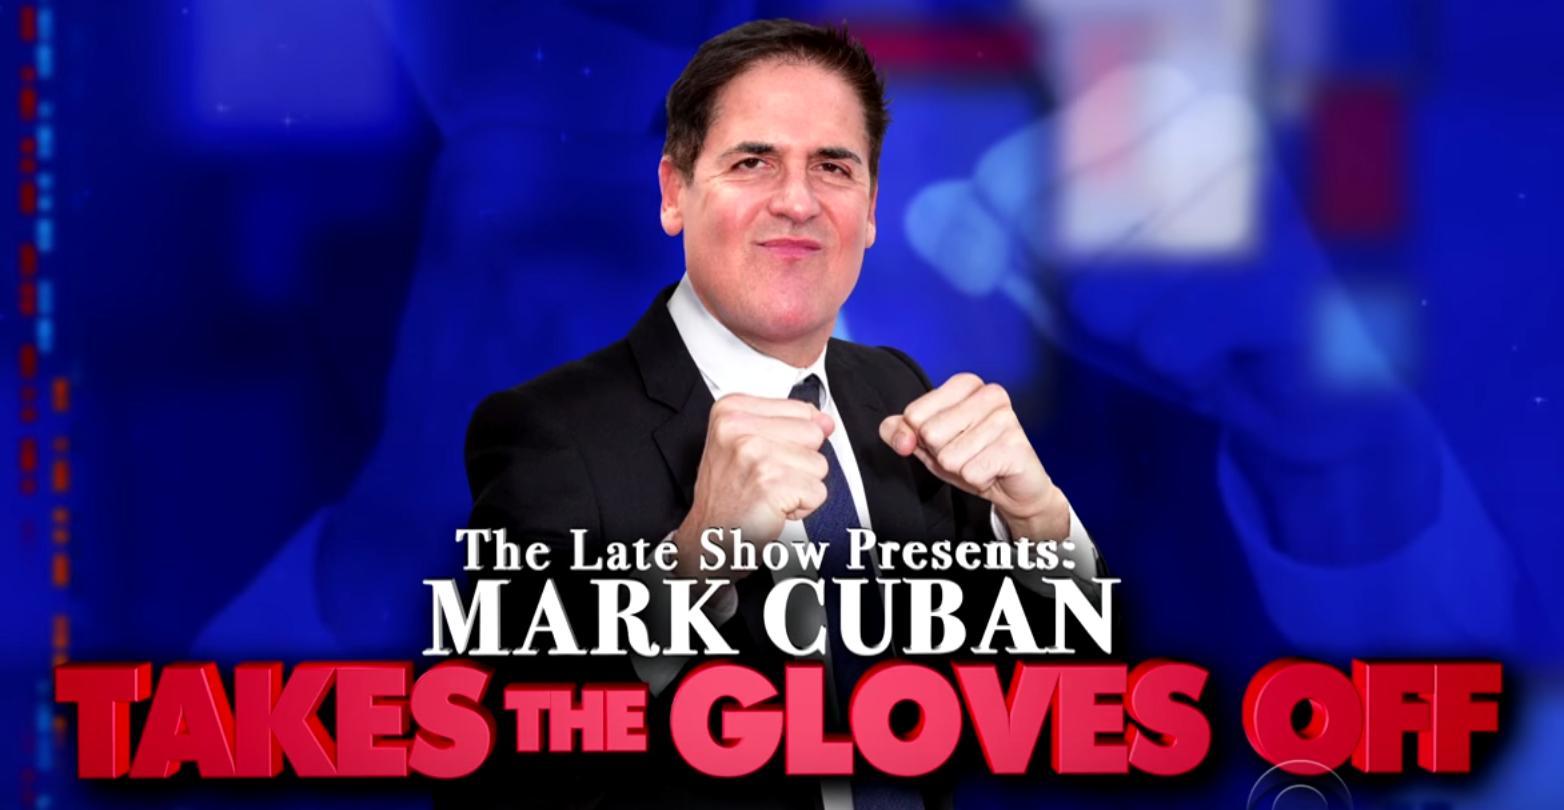 Mark Cuban Stephen Colbert